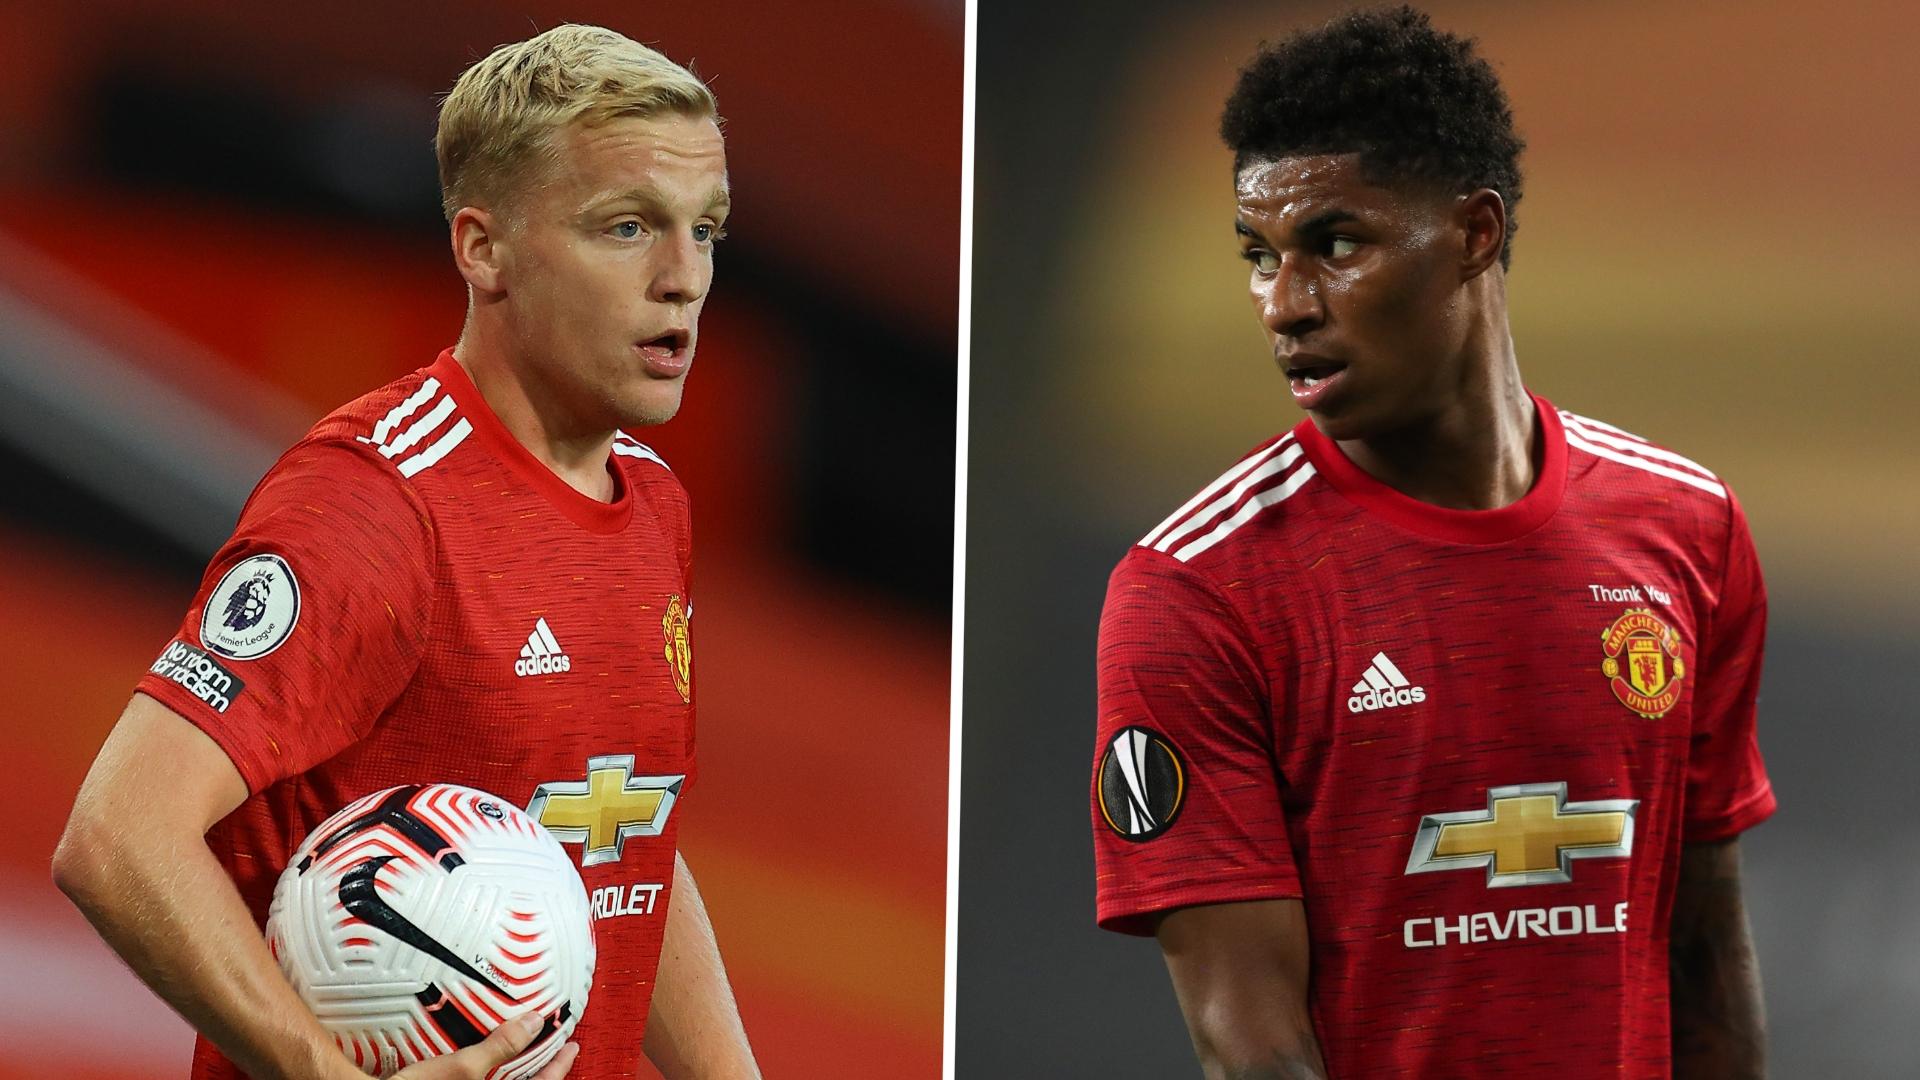 'Van de Beek could cover for Rashford on left wing' – Solskjaer sees Man Utd new boy playing 'loads of different positions'